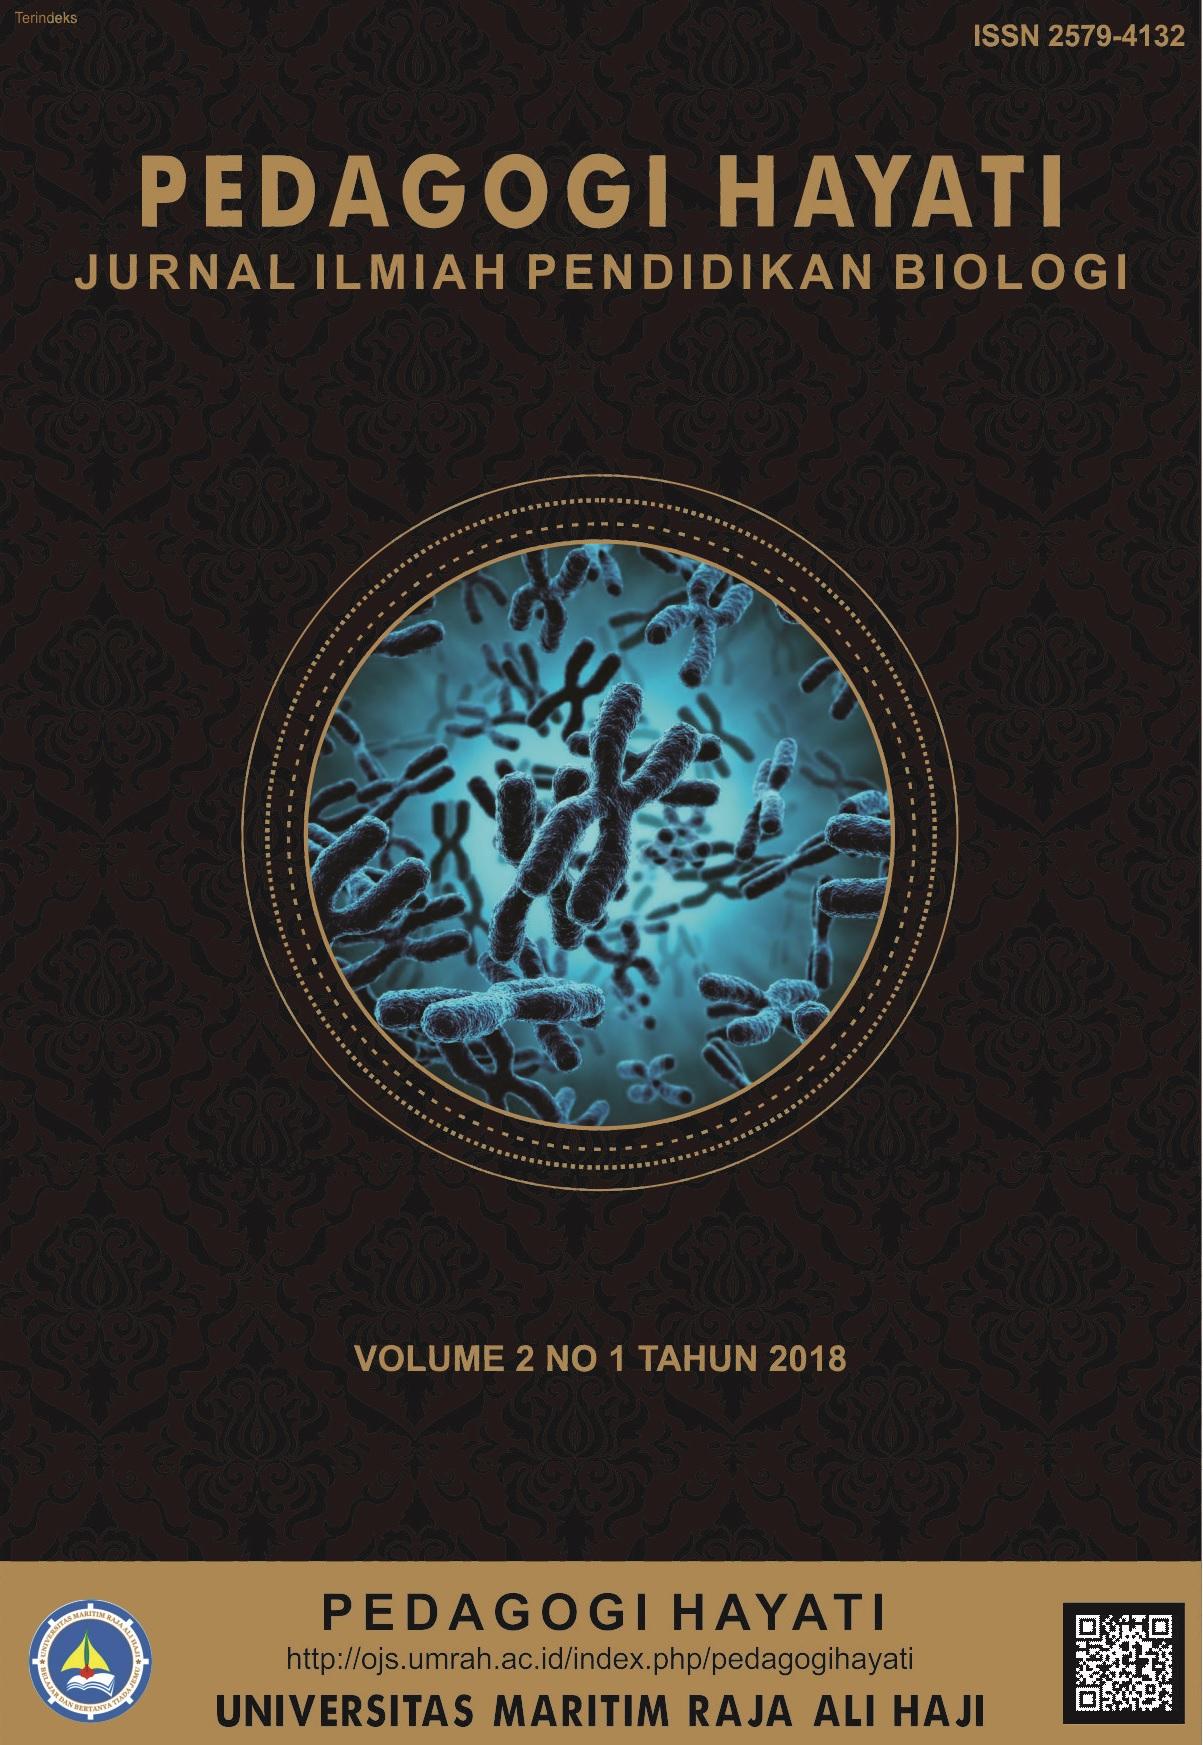 Pedagogi Hayati jurnal pendidikan biologi penelitian terbaru